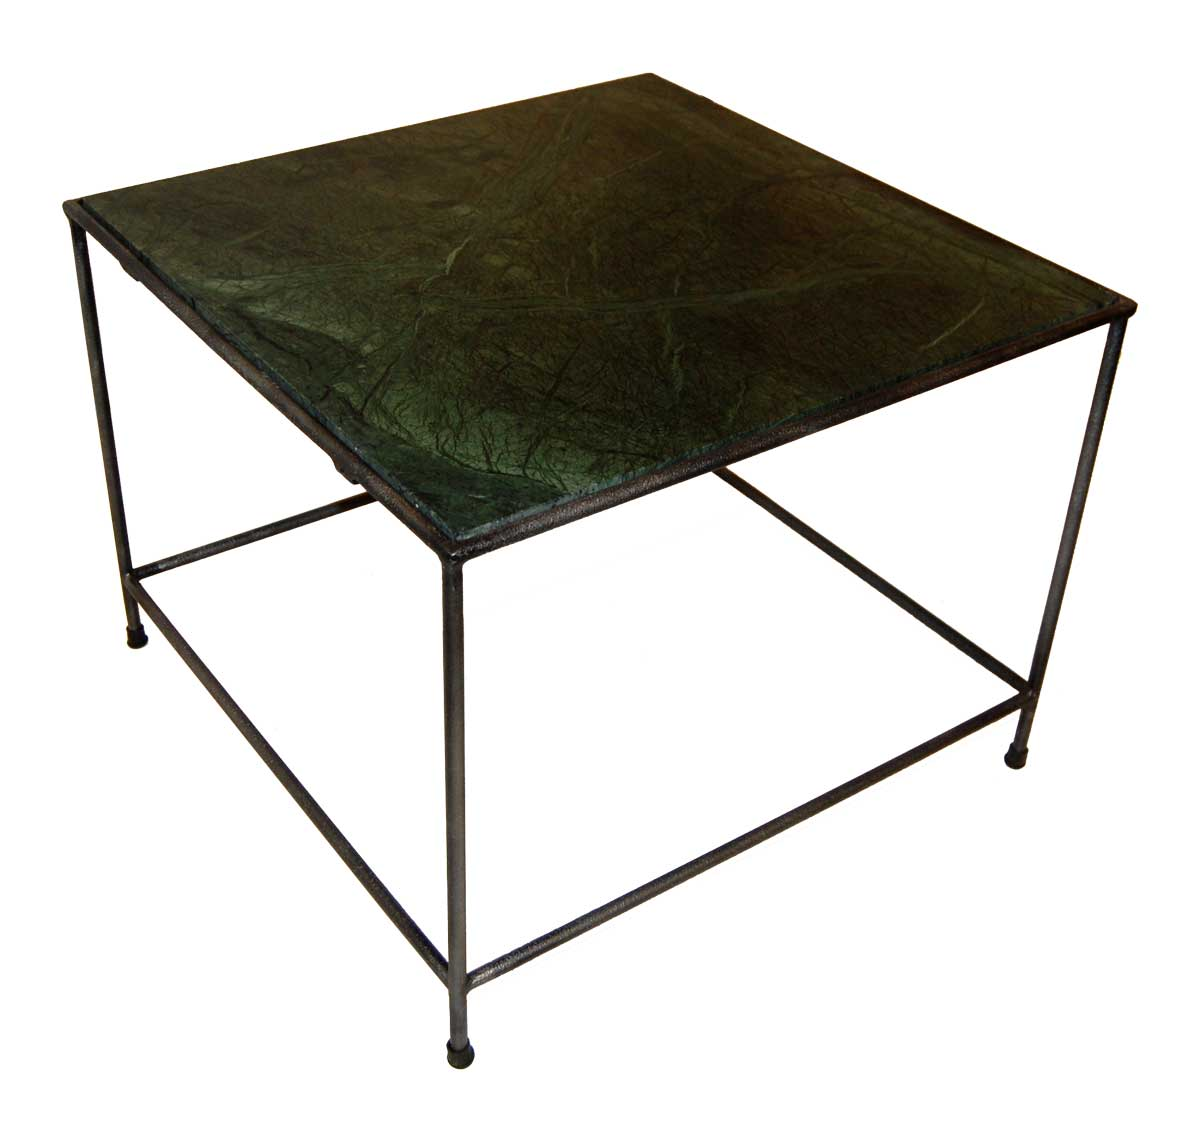 TRADEMARK LIVING Sofabord med grøn marmorplade